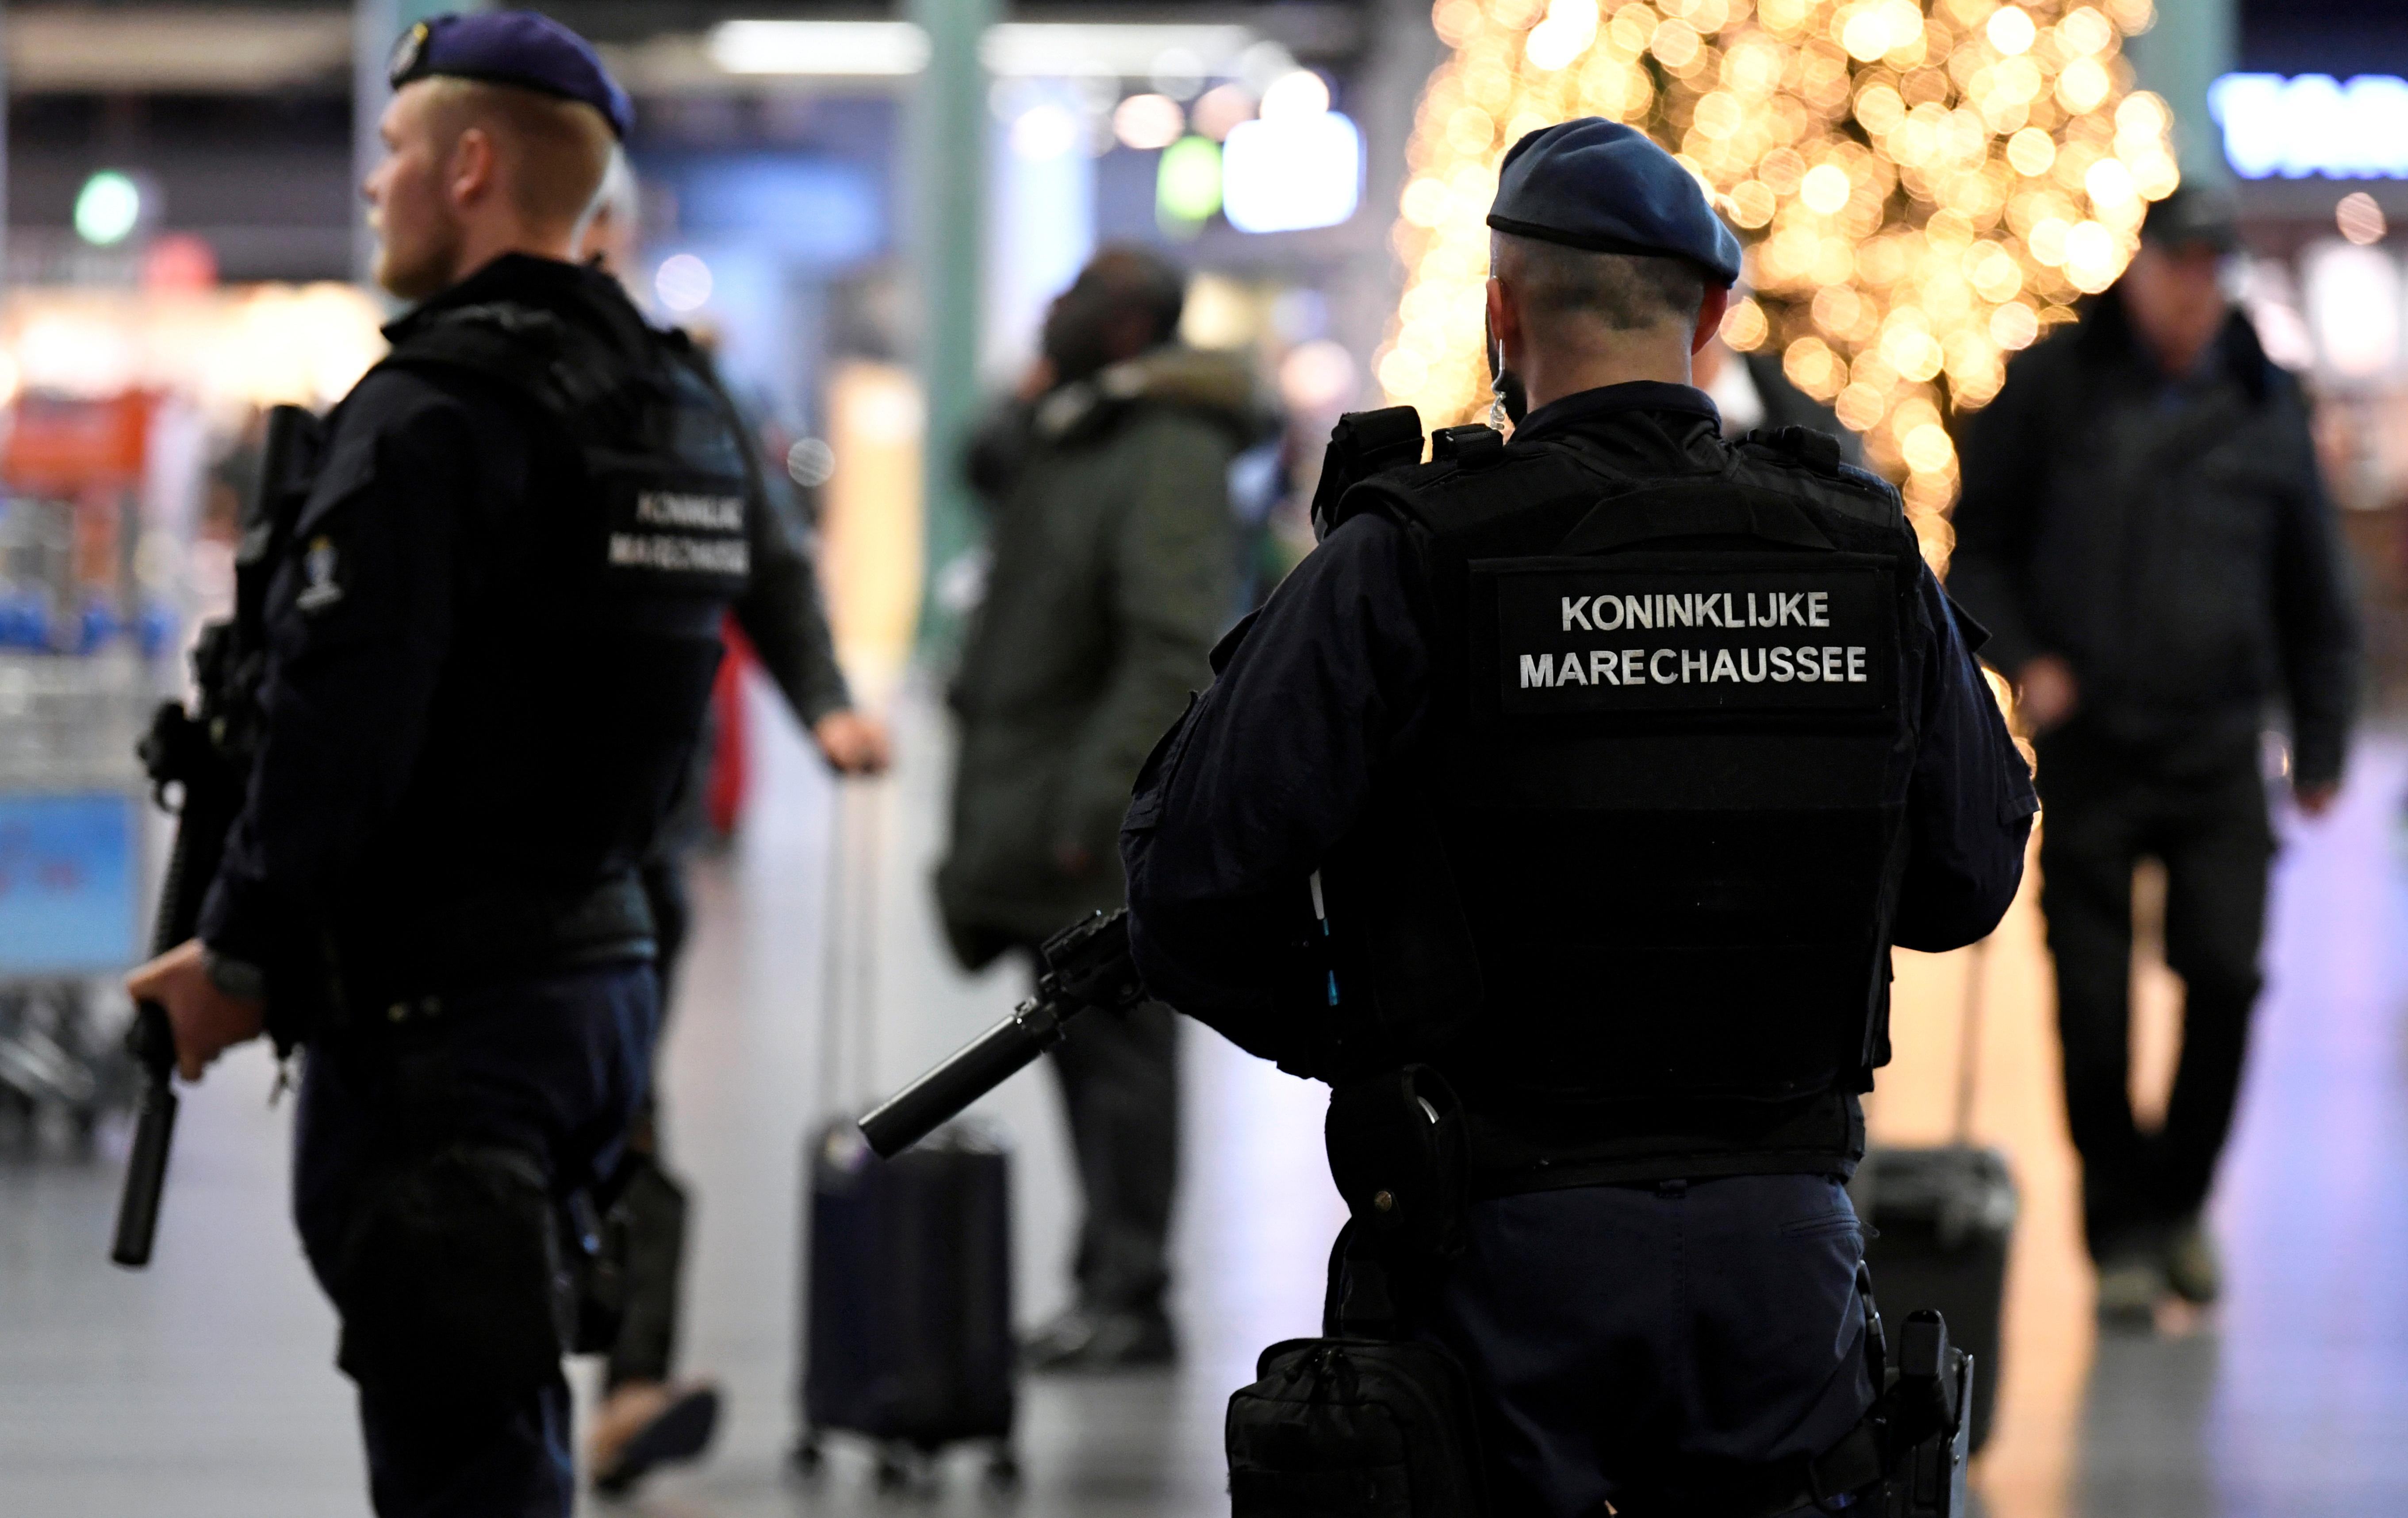 Dutch police patrol at Amsterdam's Schiphol airport, November 6, 2019.  REUTERS/Piroschka van de Wouw/File Photo